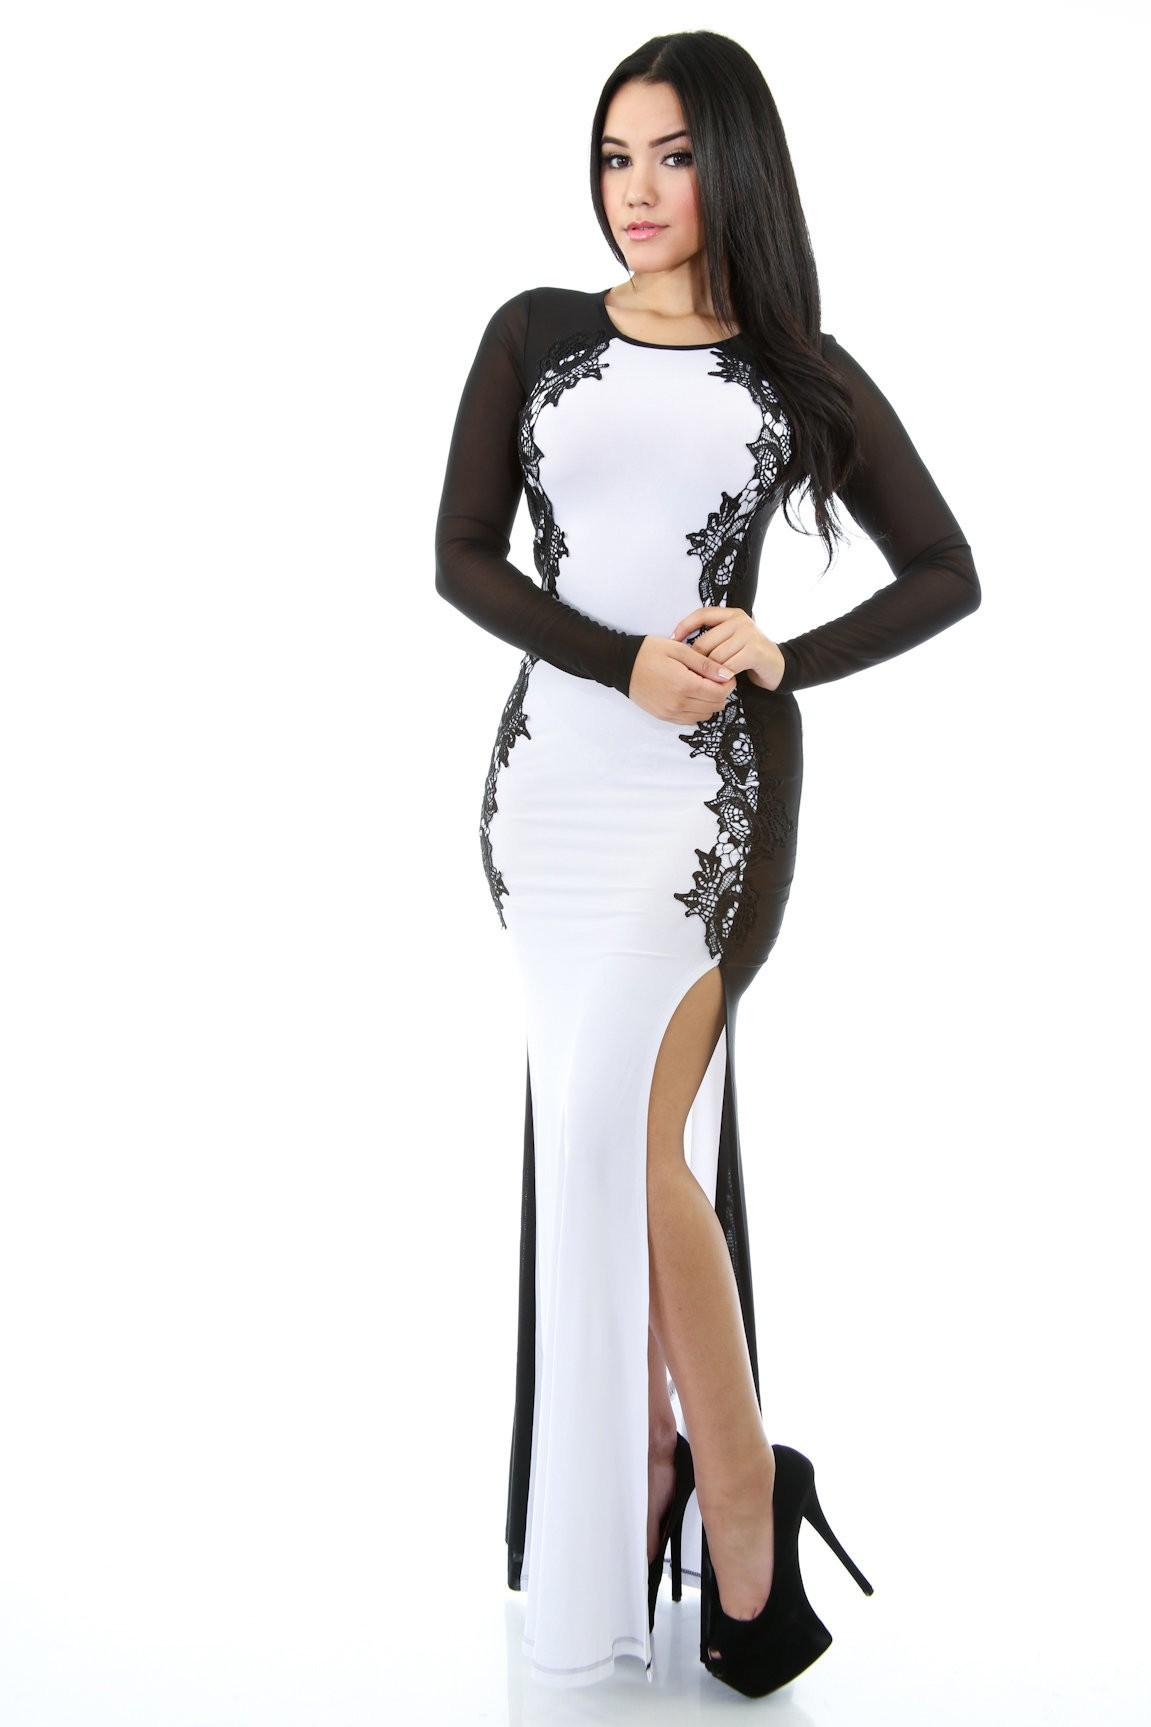 Simple Beauty Kills the Game Maxi Dress